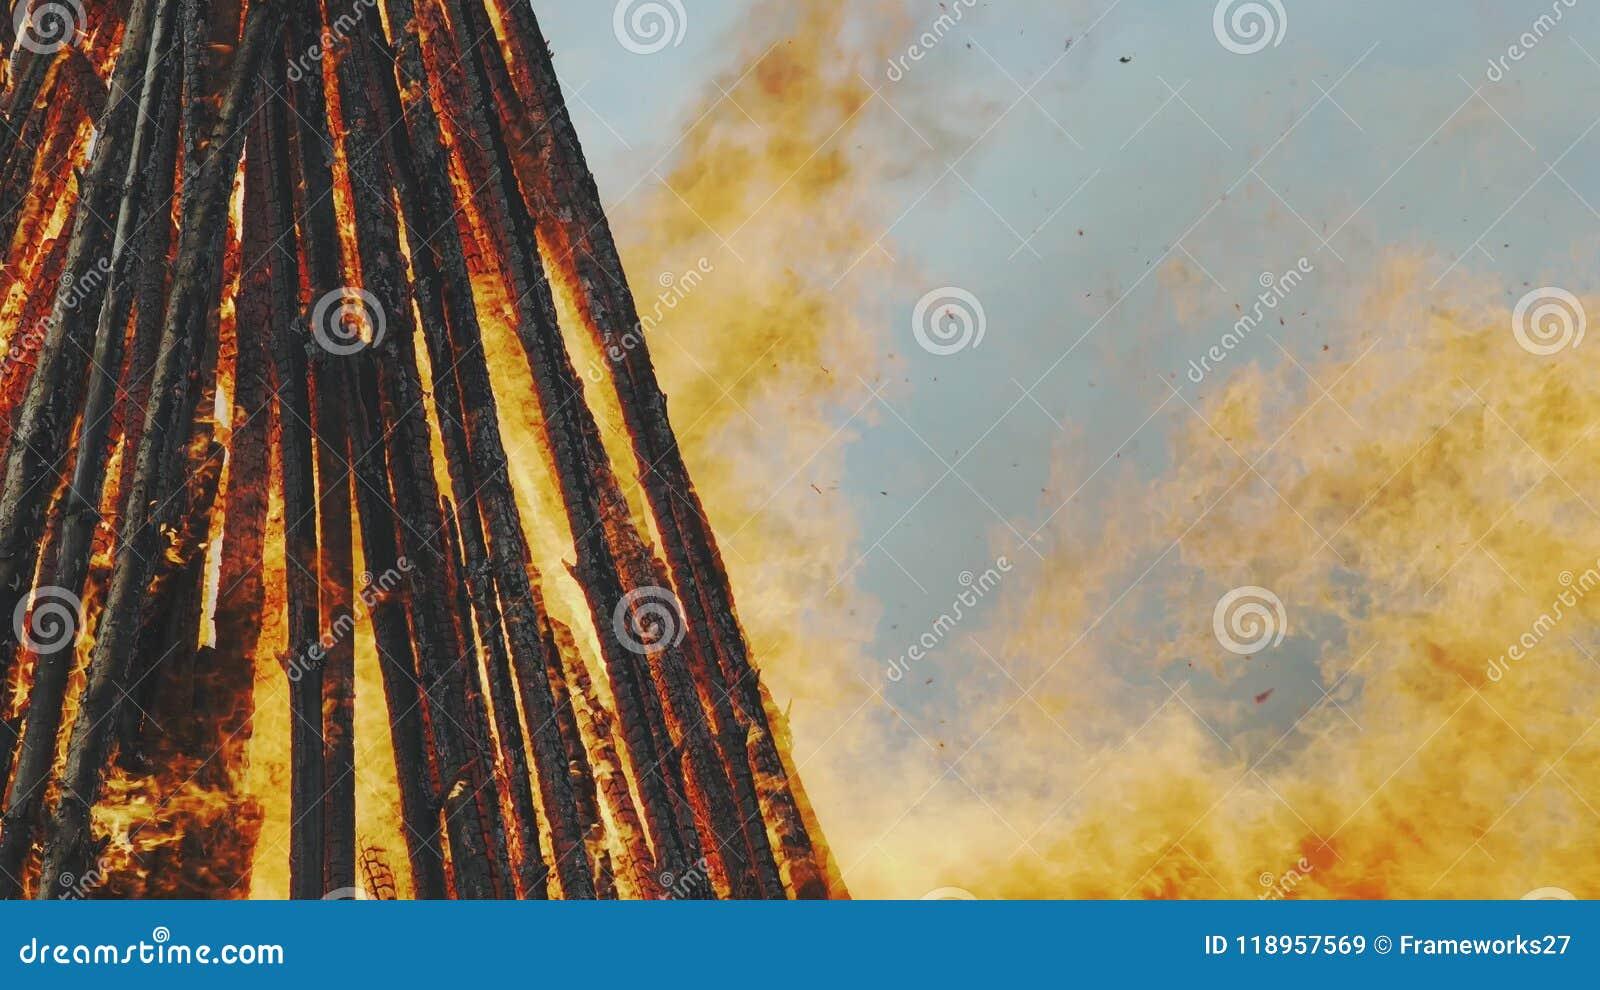 Easter Sunday Horizon Is Burning >> Burning Blazing Easter Fire Stock Video Video Of Blaze Bright